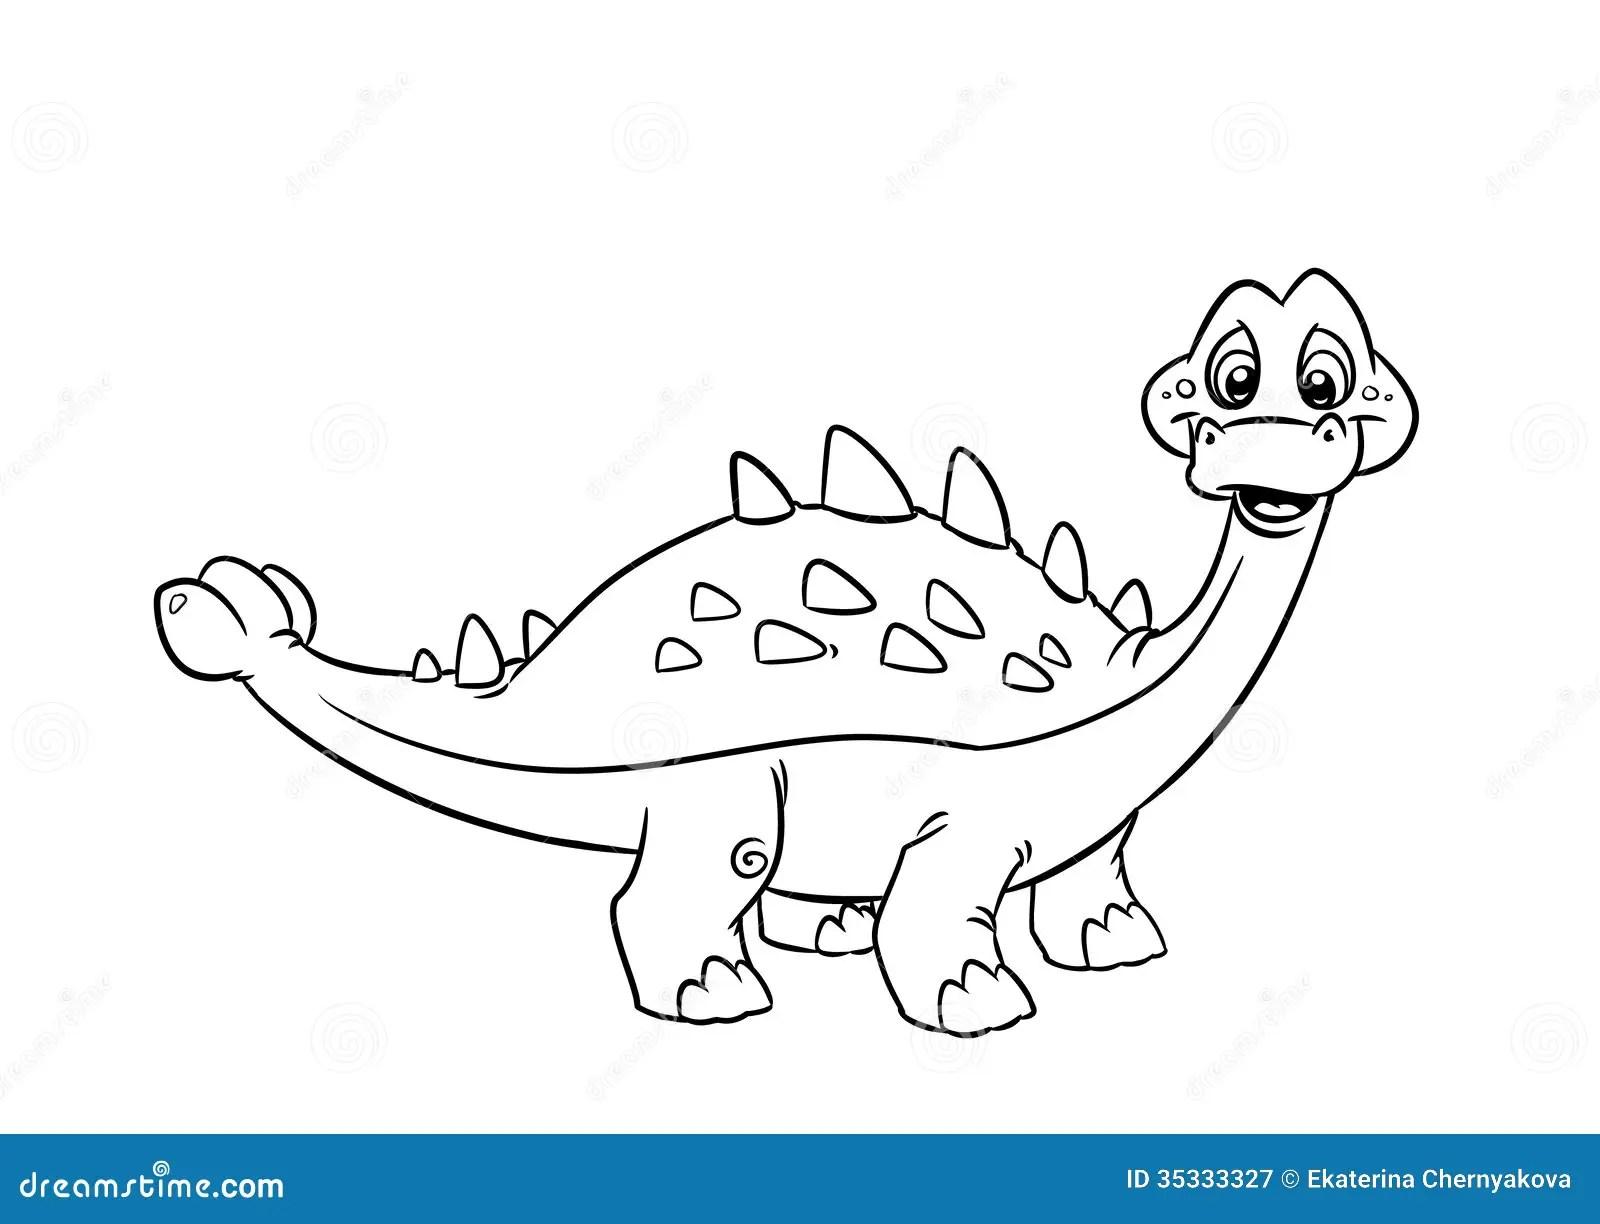 Dinosaur Pinacosaurus Coloring Pages Stock Illustration